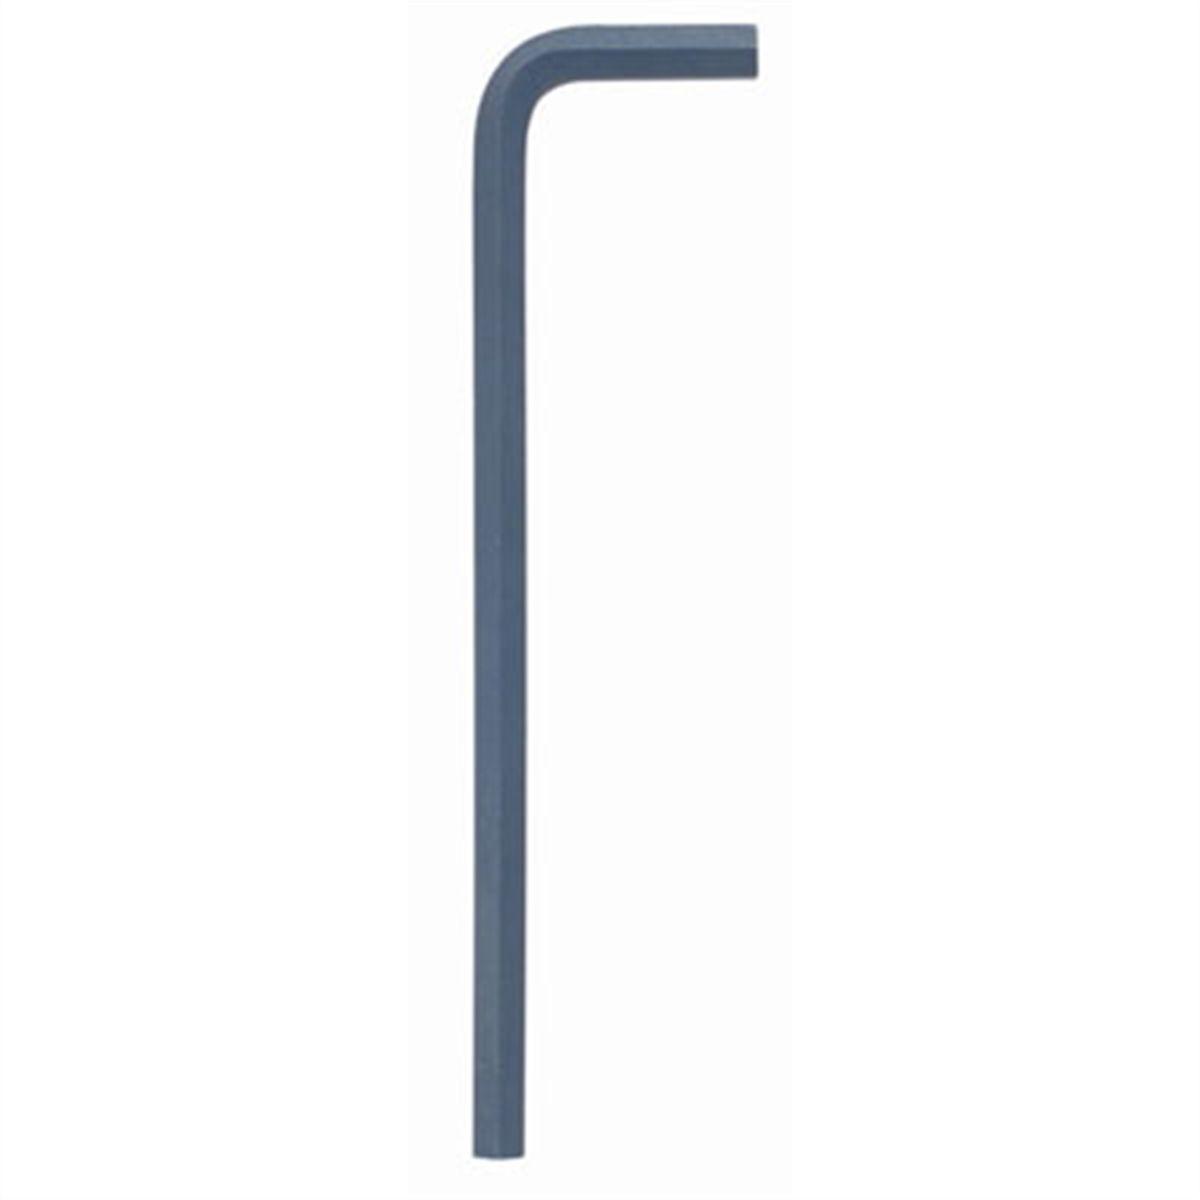 Bondhus 12116 1//2-Inch Long Hex L-Wrench